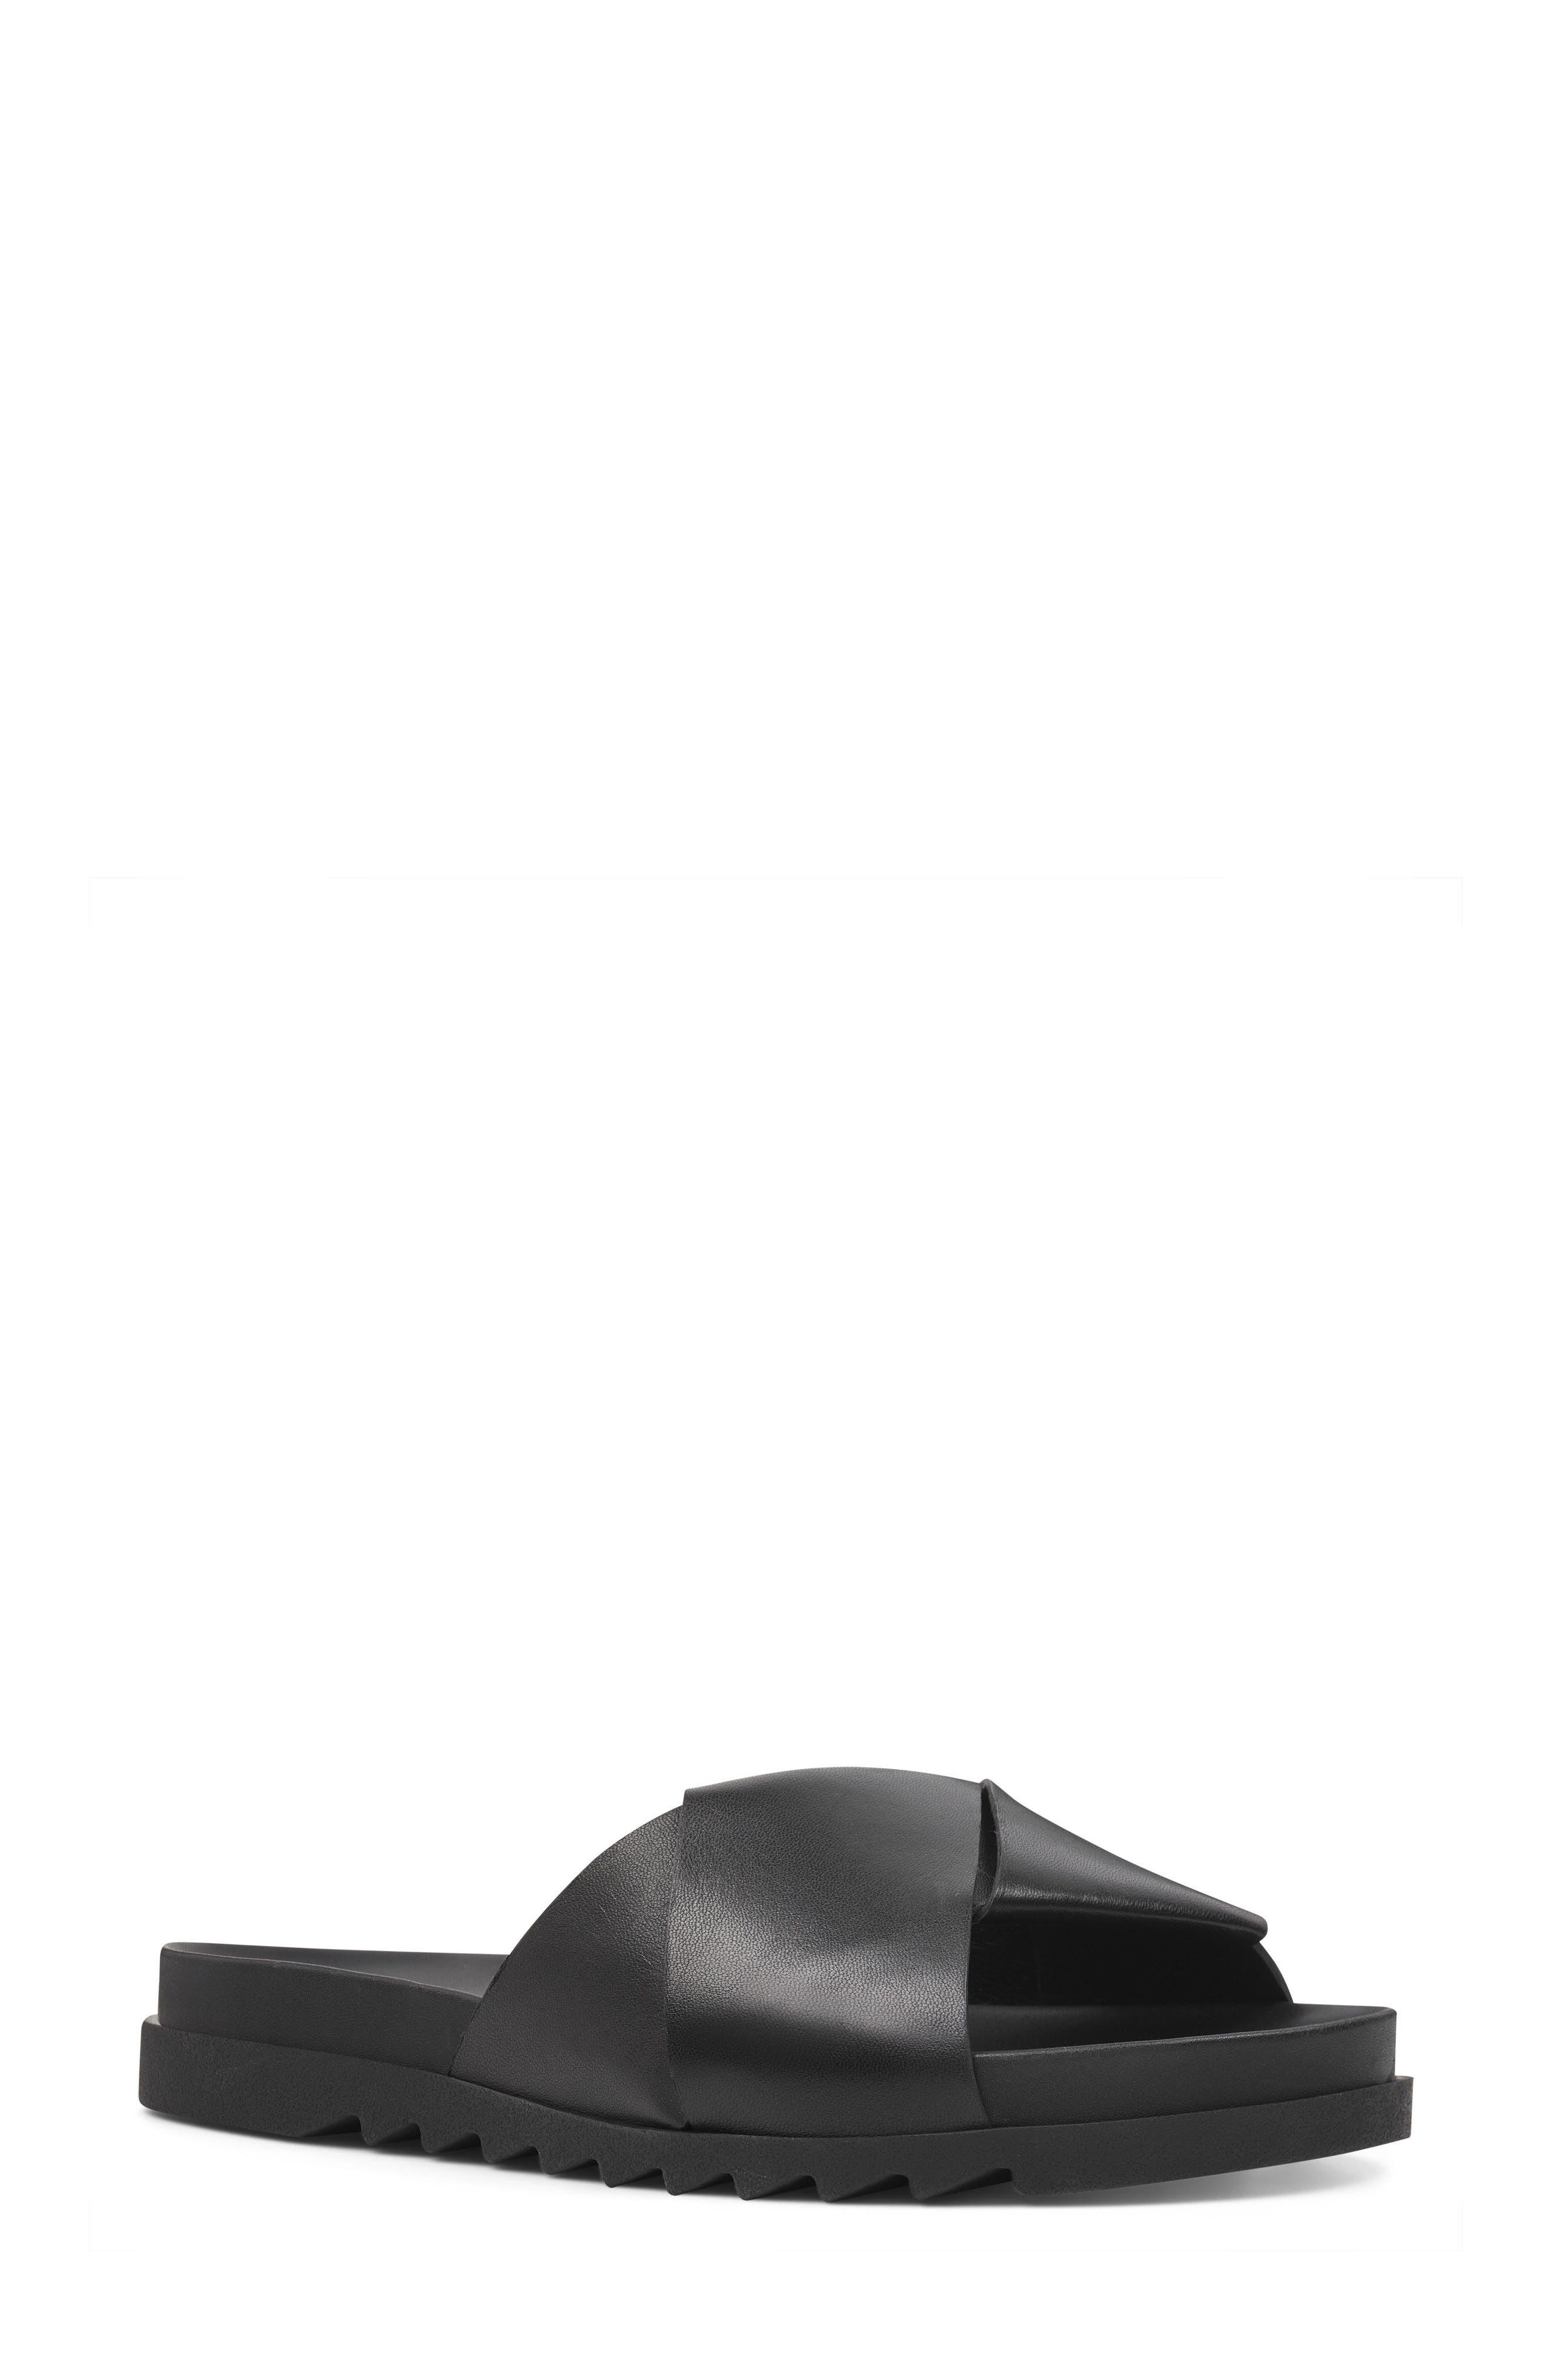 Furaish Slide Sandal,                             Main thumbnail 1, color,                             001